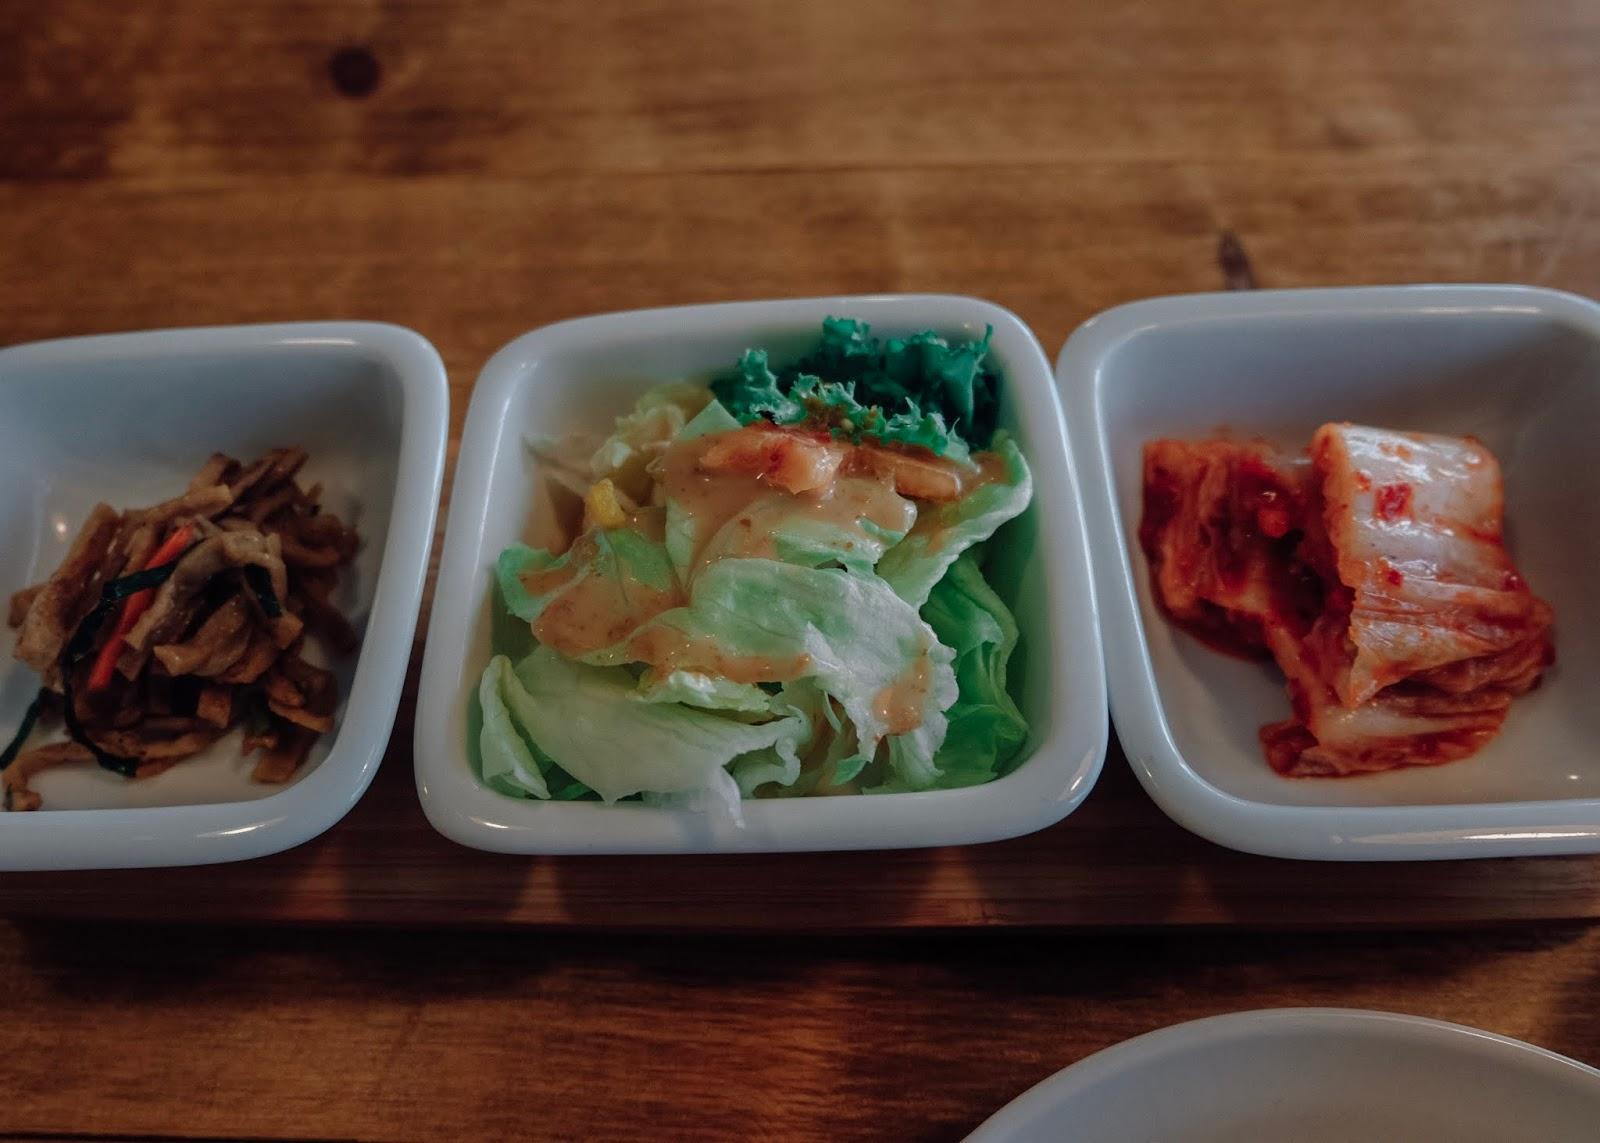 Eid Restaurant Seoul Korea Curitan Aqalili